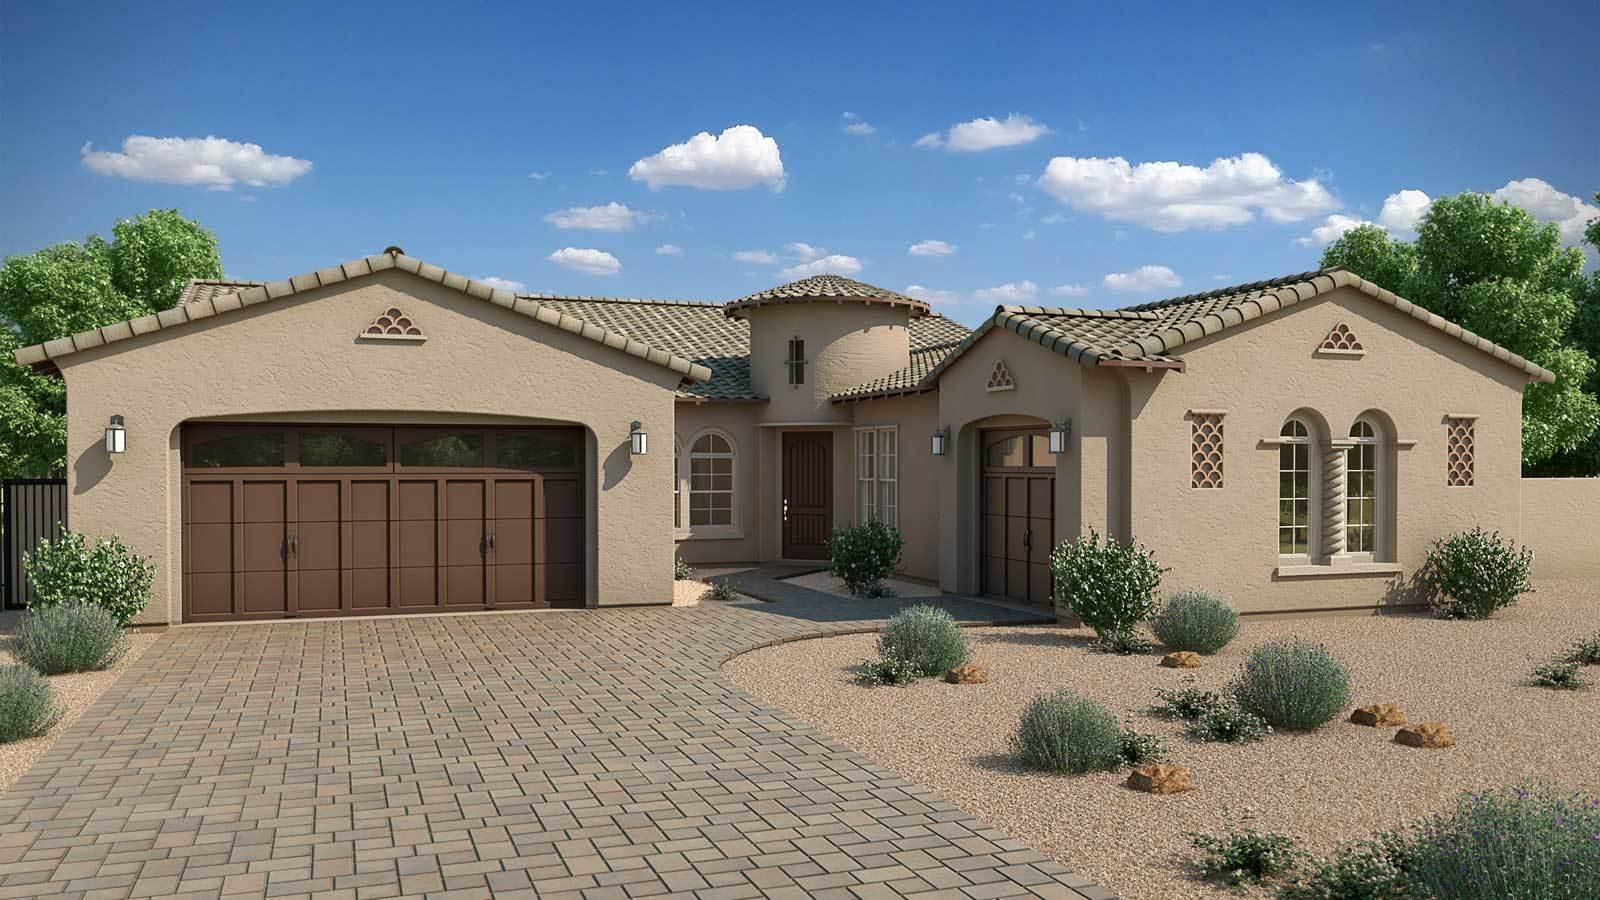 Single Family for Sale at Mission Estates - Quartz 2361 E. Cherrywood Place Chandler, Arizona 85249 United States